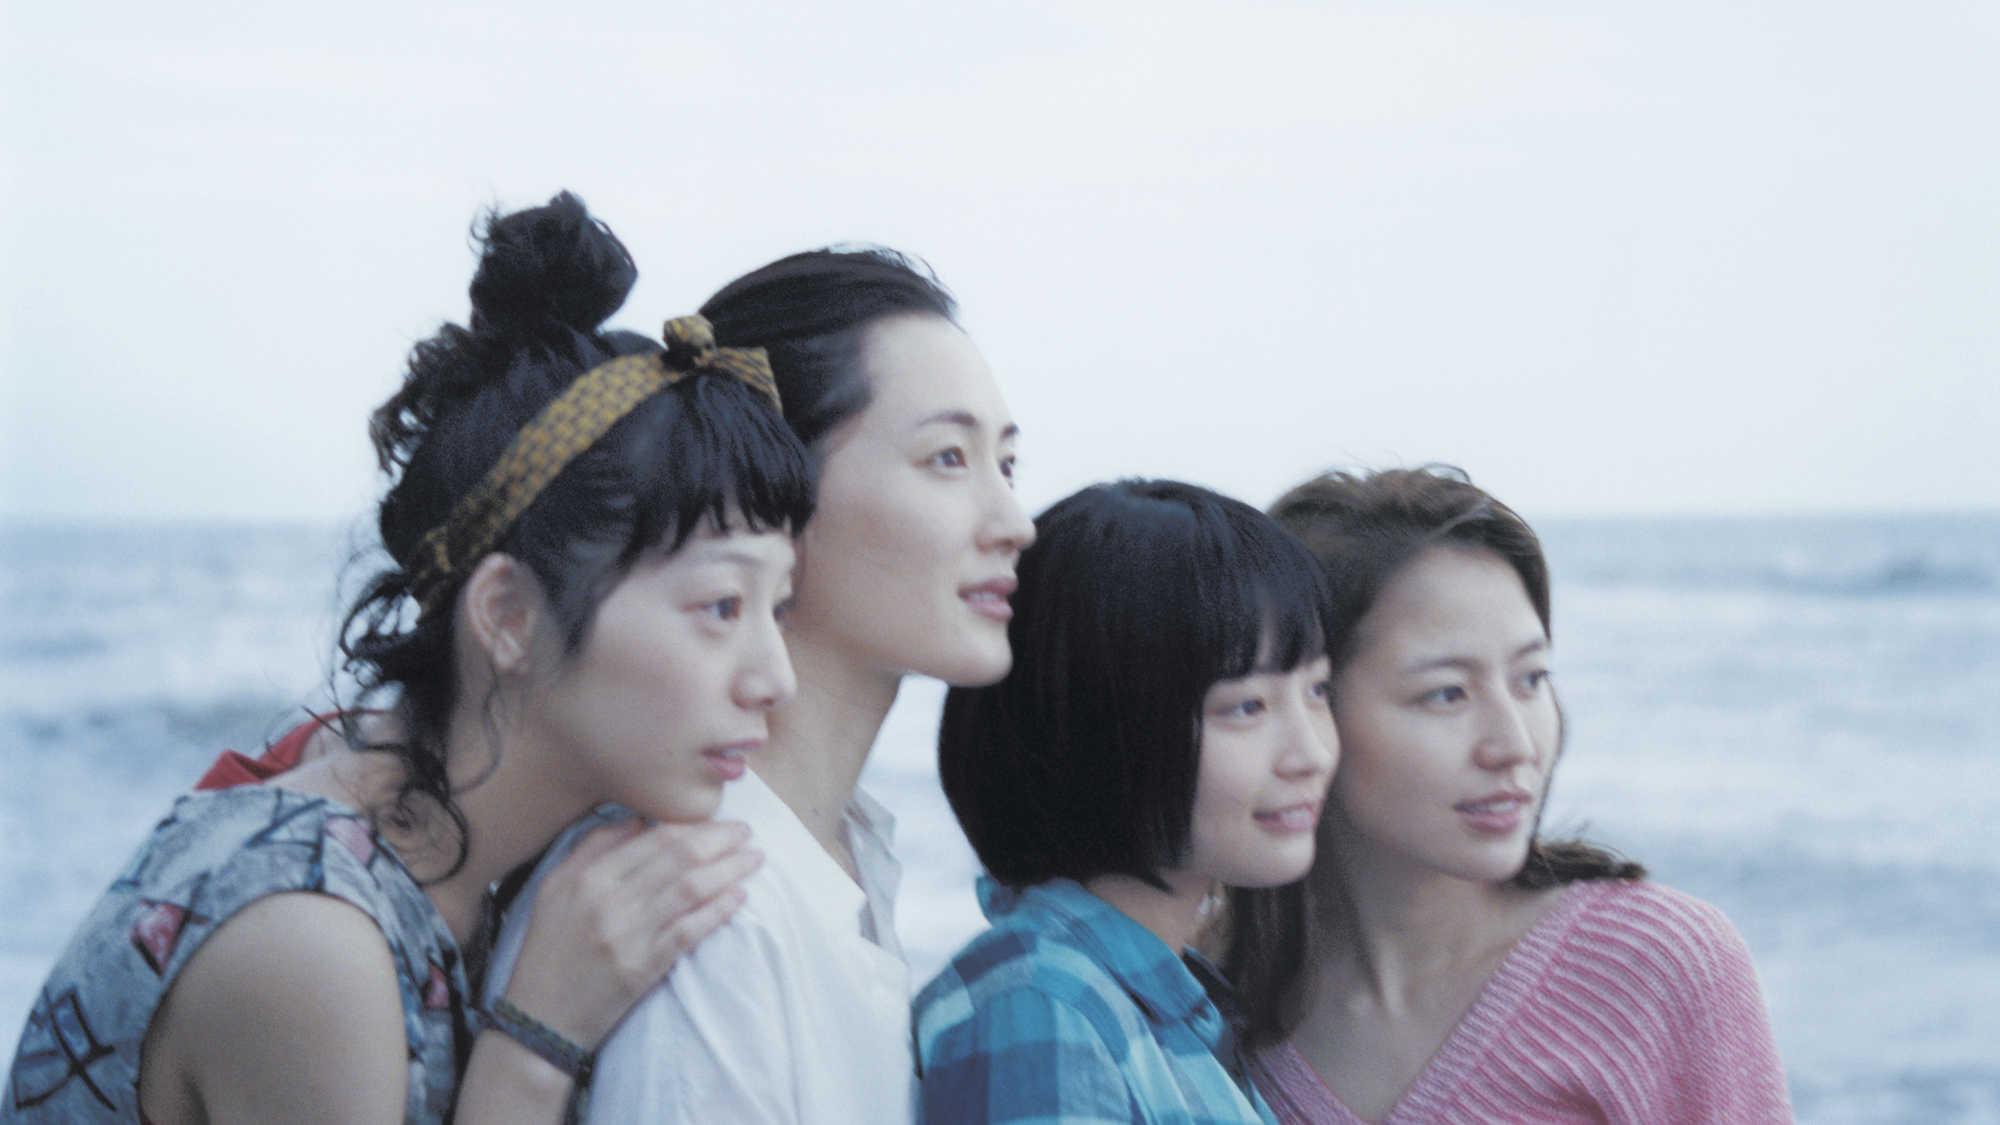 Our Little Sister O New Zealand International Film Festival